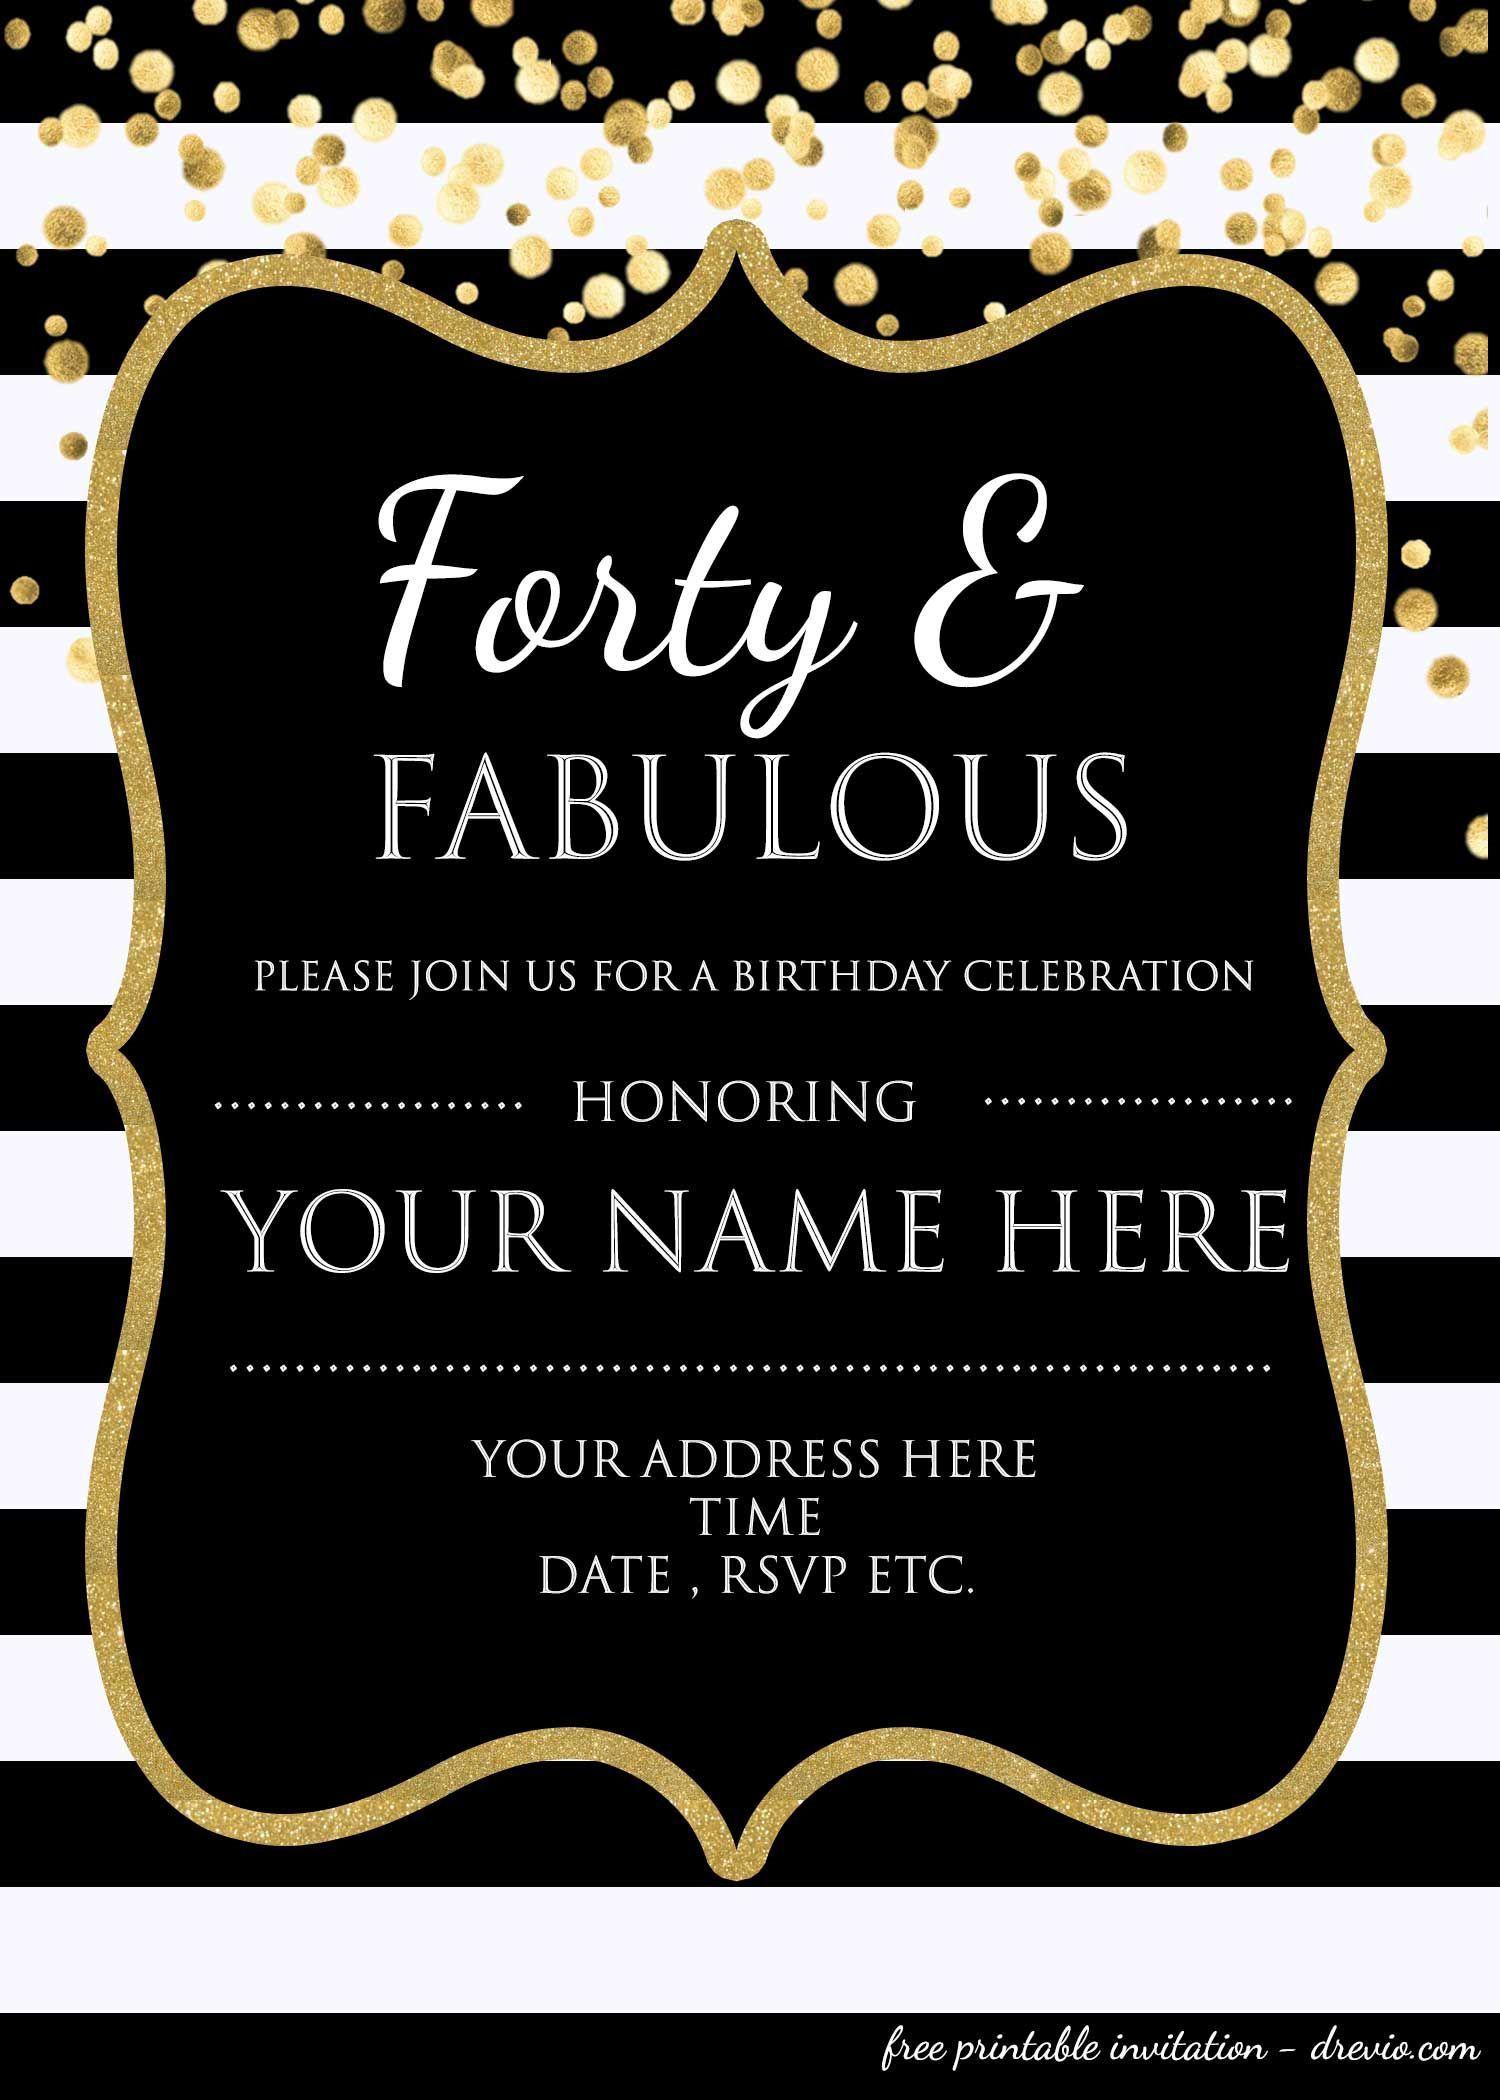 007 Impressive 40th Birthday Party Invite Template Free Inspiration Full